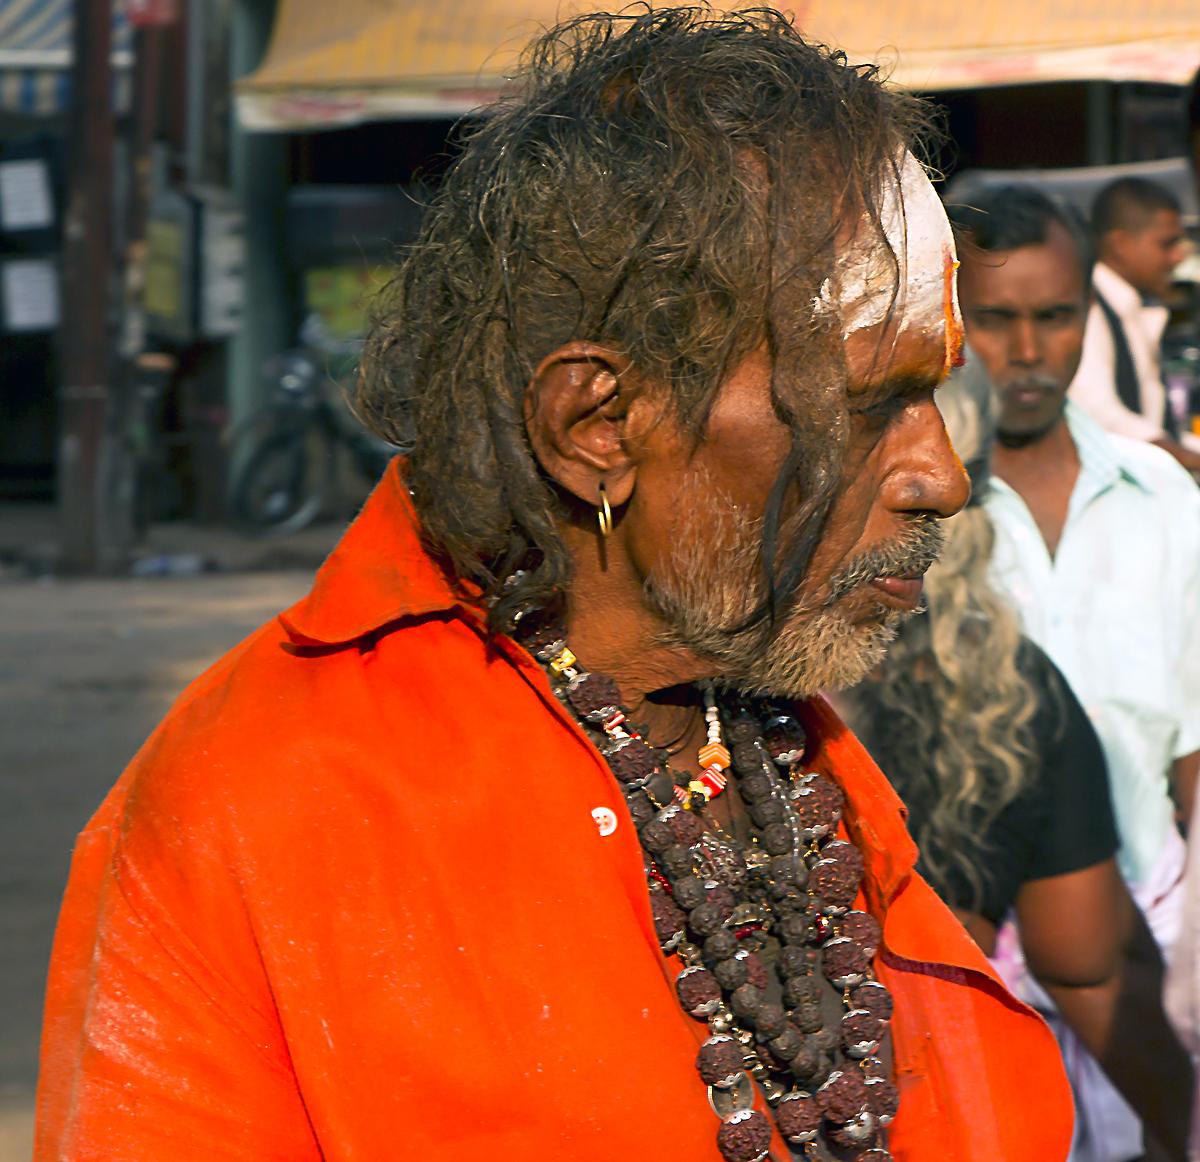 INDIEN Chennai Kanchipuram Tempel Menschen Tempel FINEST-onTour 7752.jpg